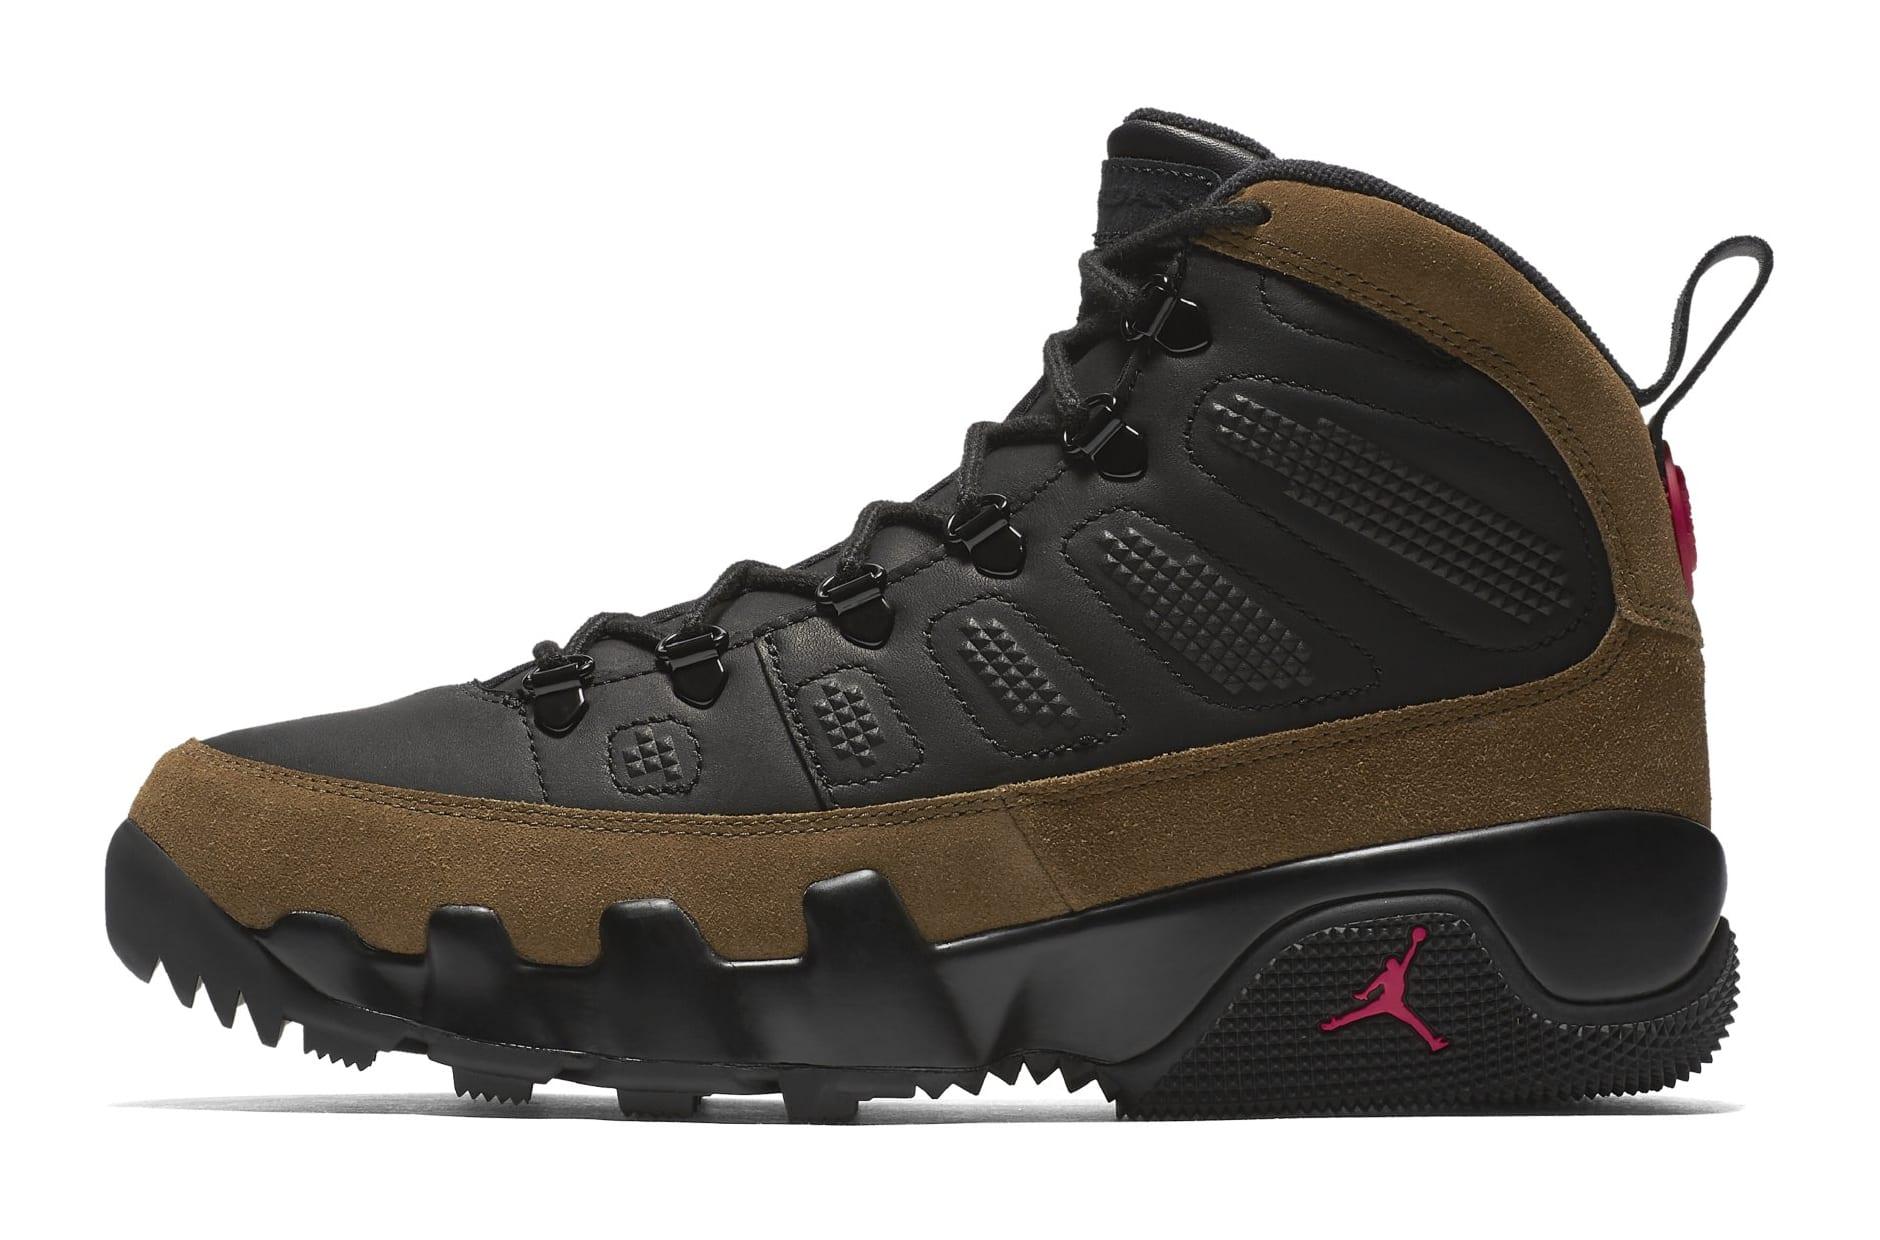 Air Jordan 9 NRG Boot 'Olive' AR4491-012 (Lateral)